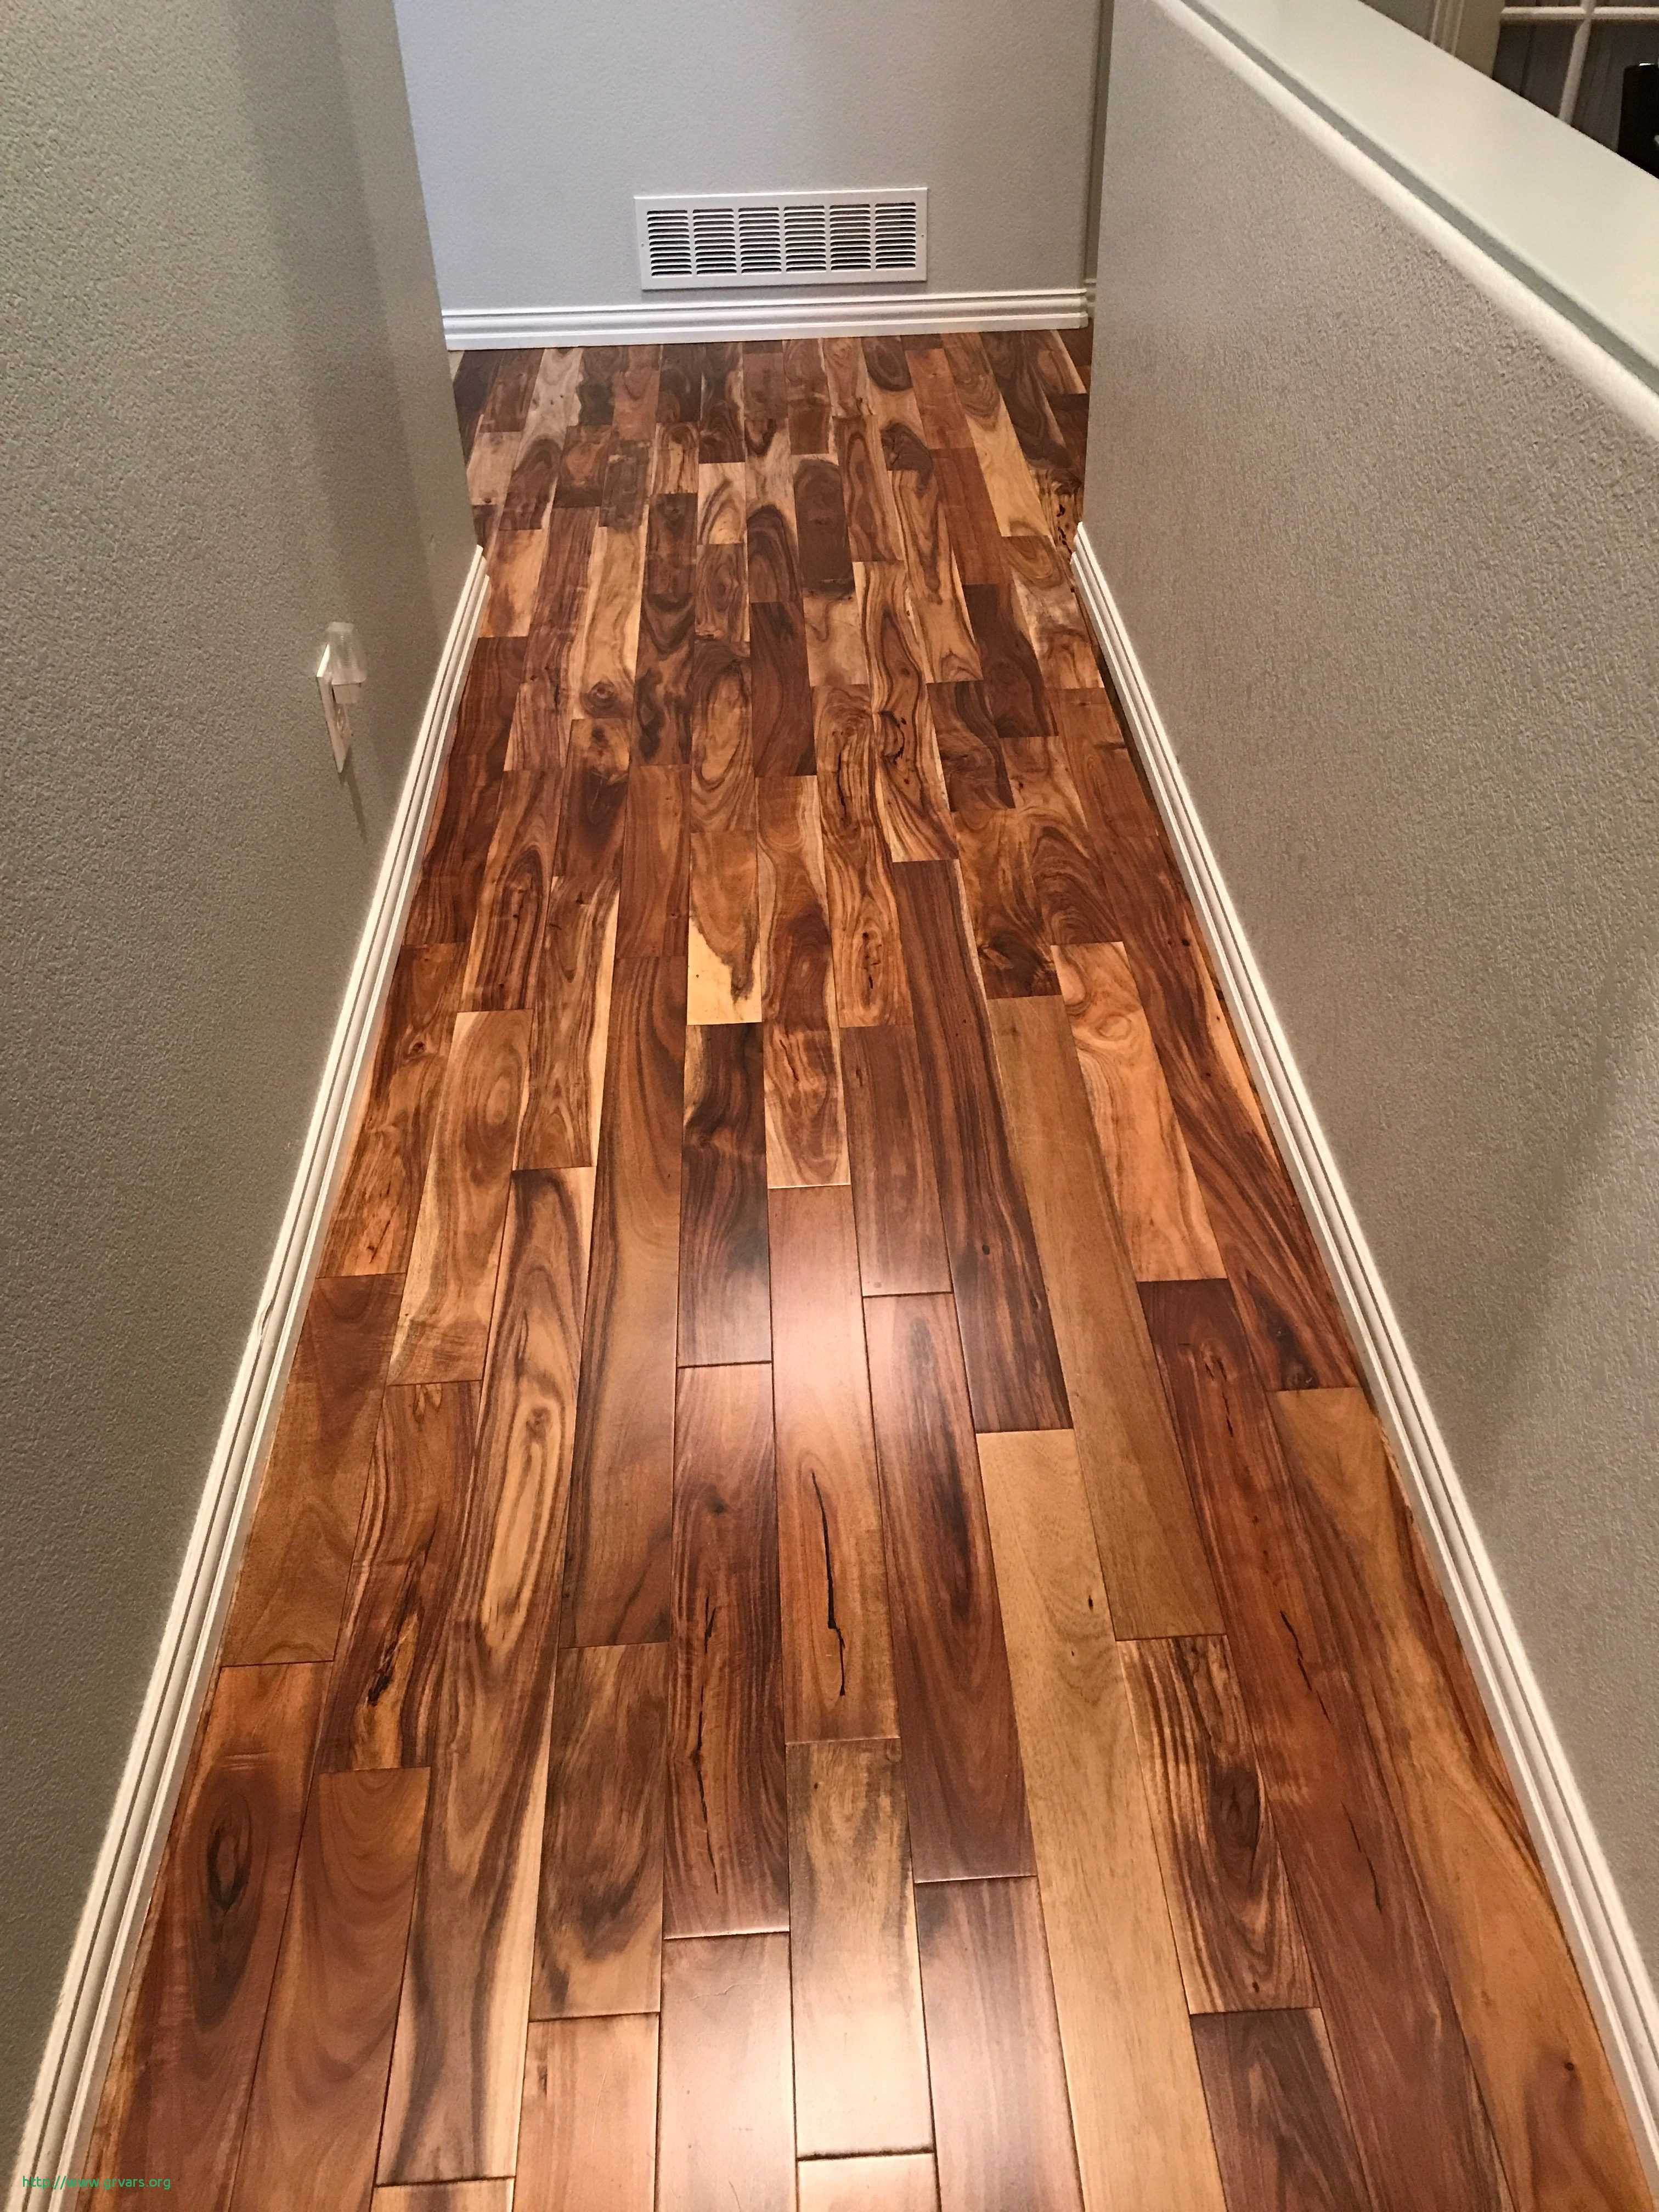 walnut hardwood flooring ottawa of 18 unique empire hardwood floor prices ideas blog intended for empire hardwood floor prices charmant engineered hardwood floorscapers